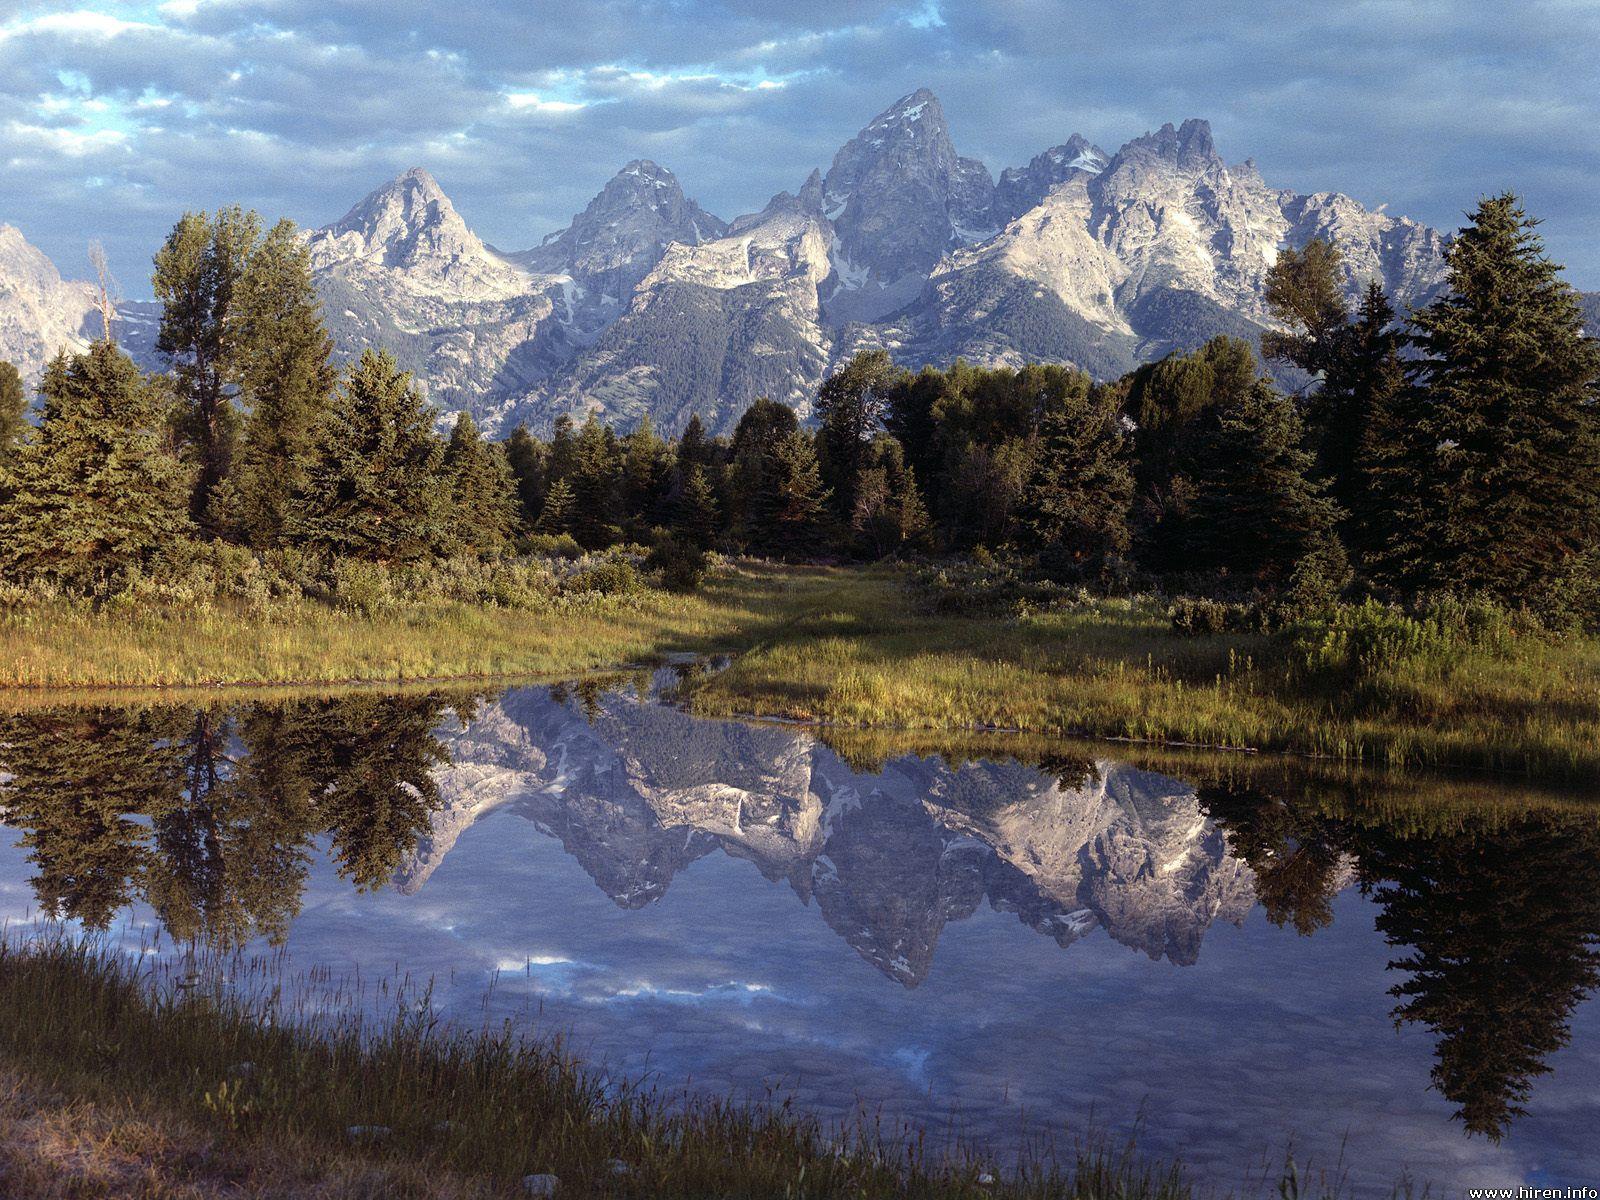 Yellowstone Background wallpaper 1600x1200 27539 1600x1200